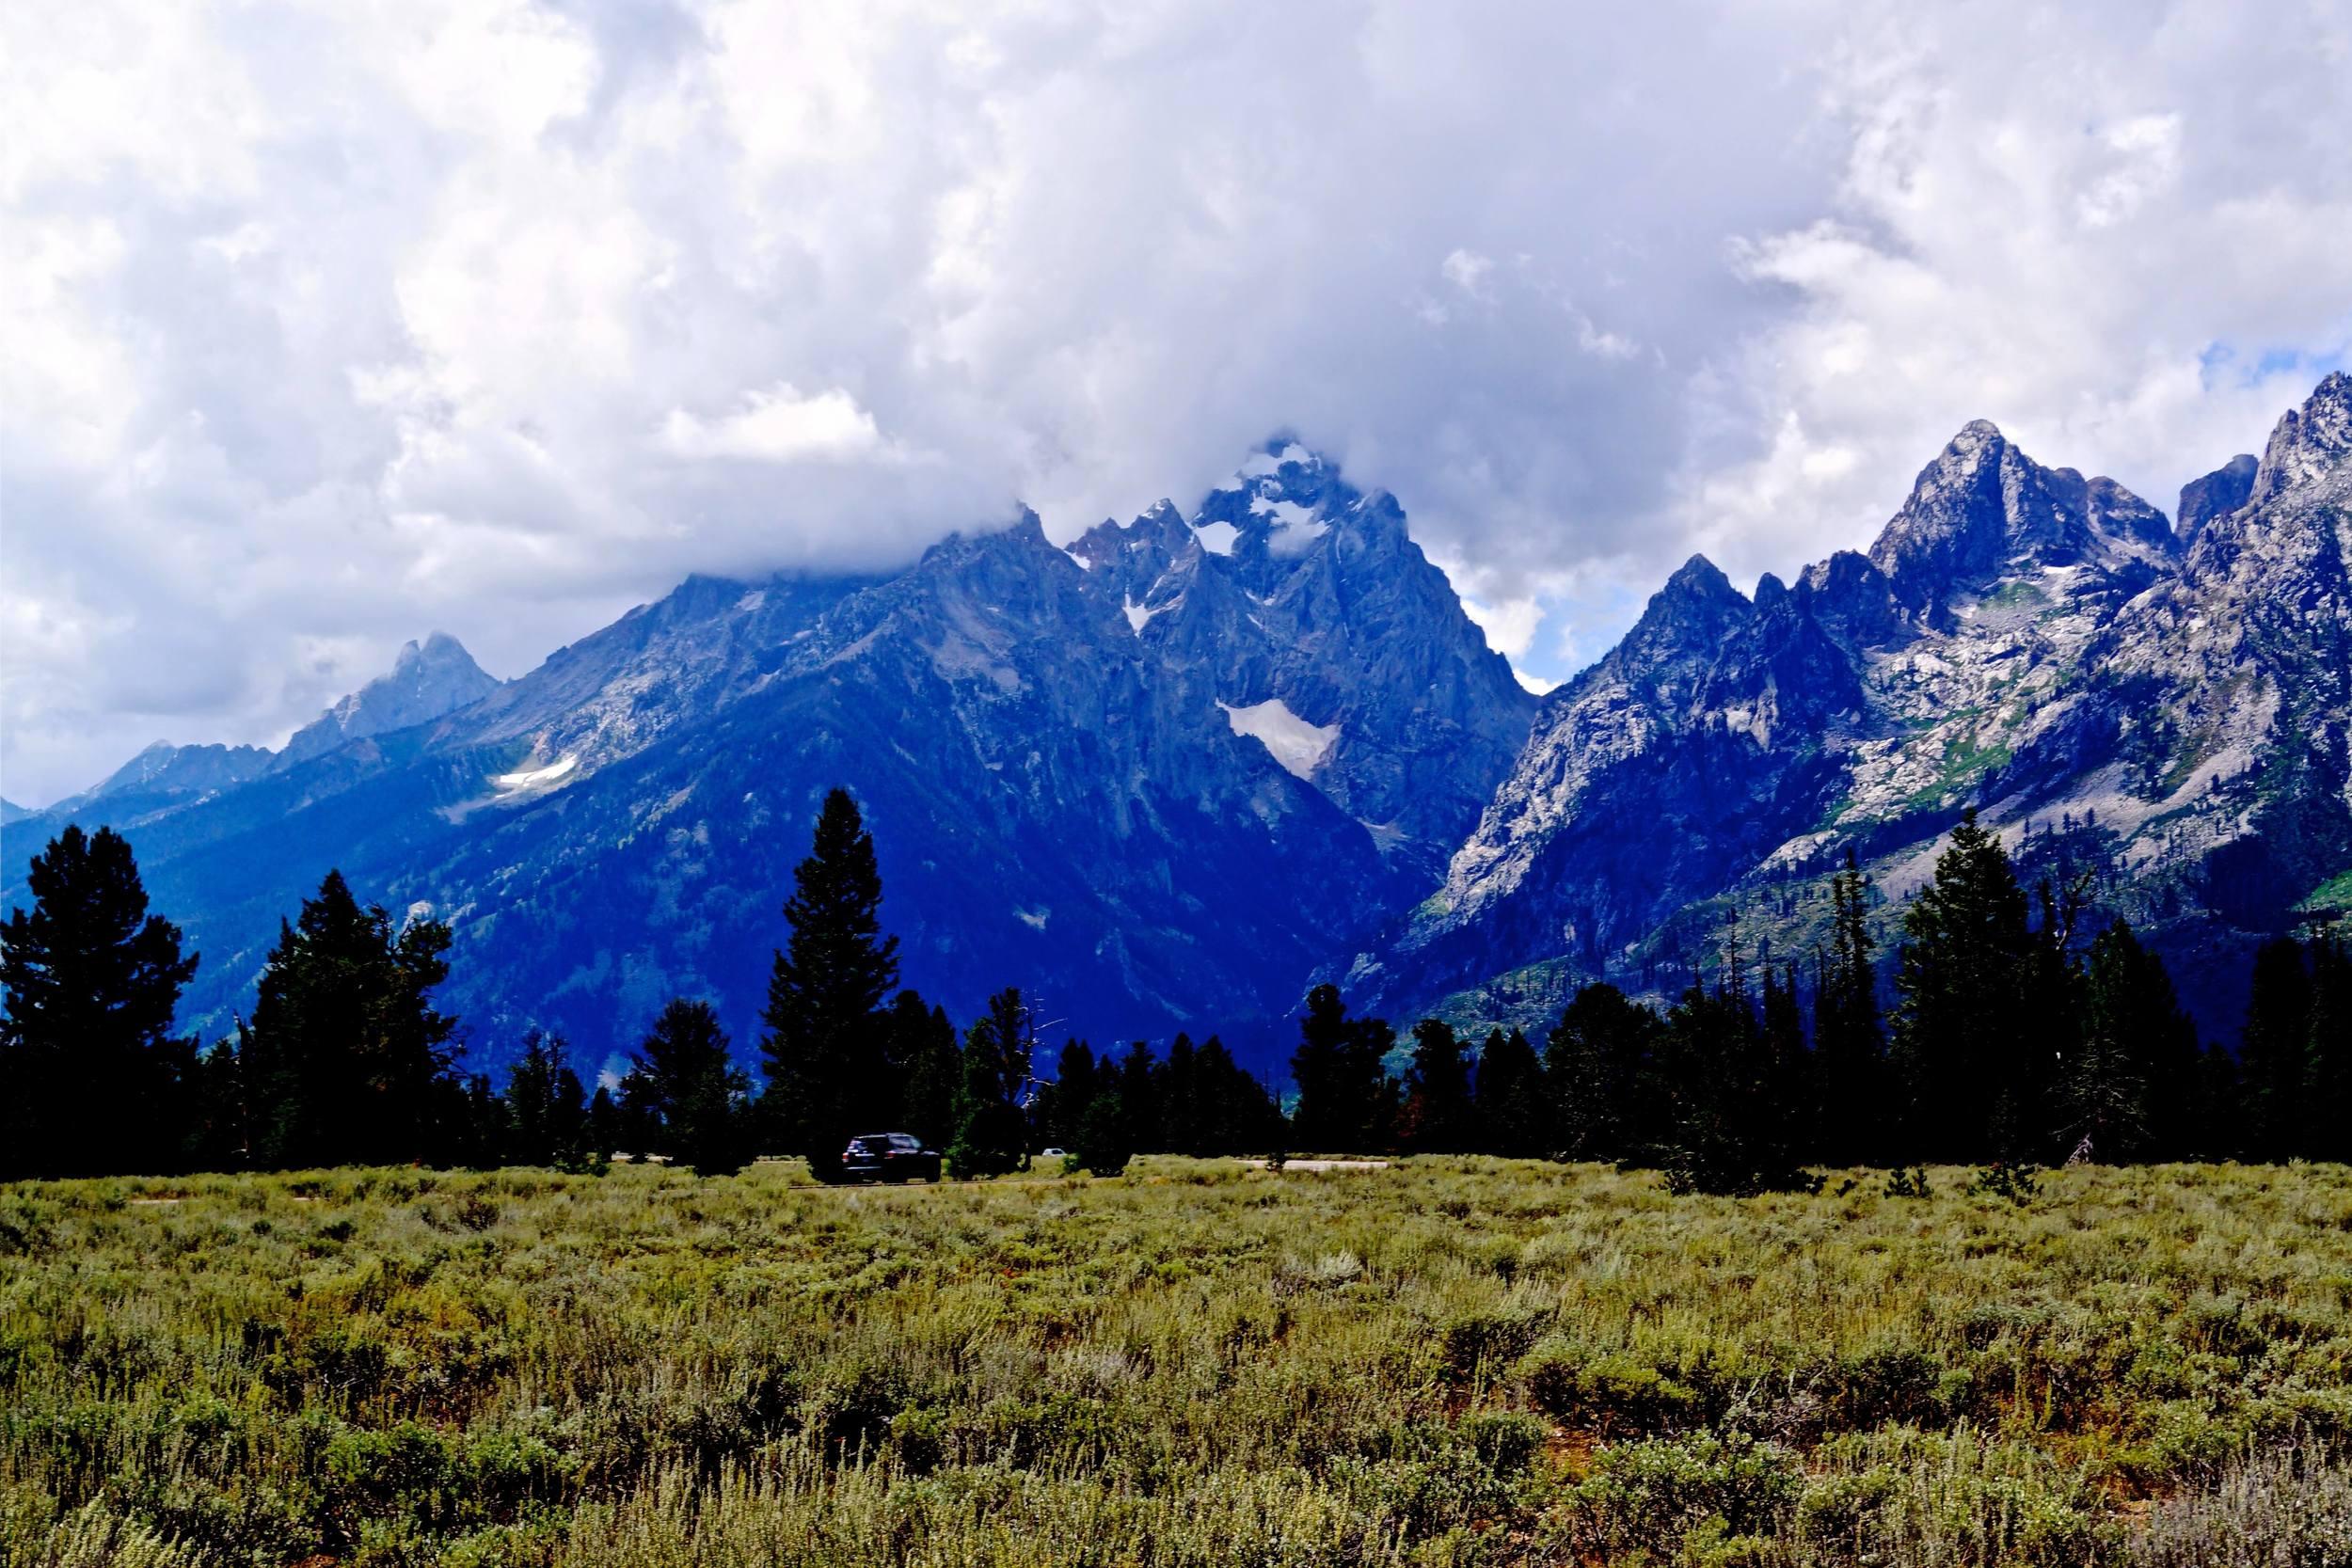 Grand Teton National Park, Wyoming, August 2014